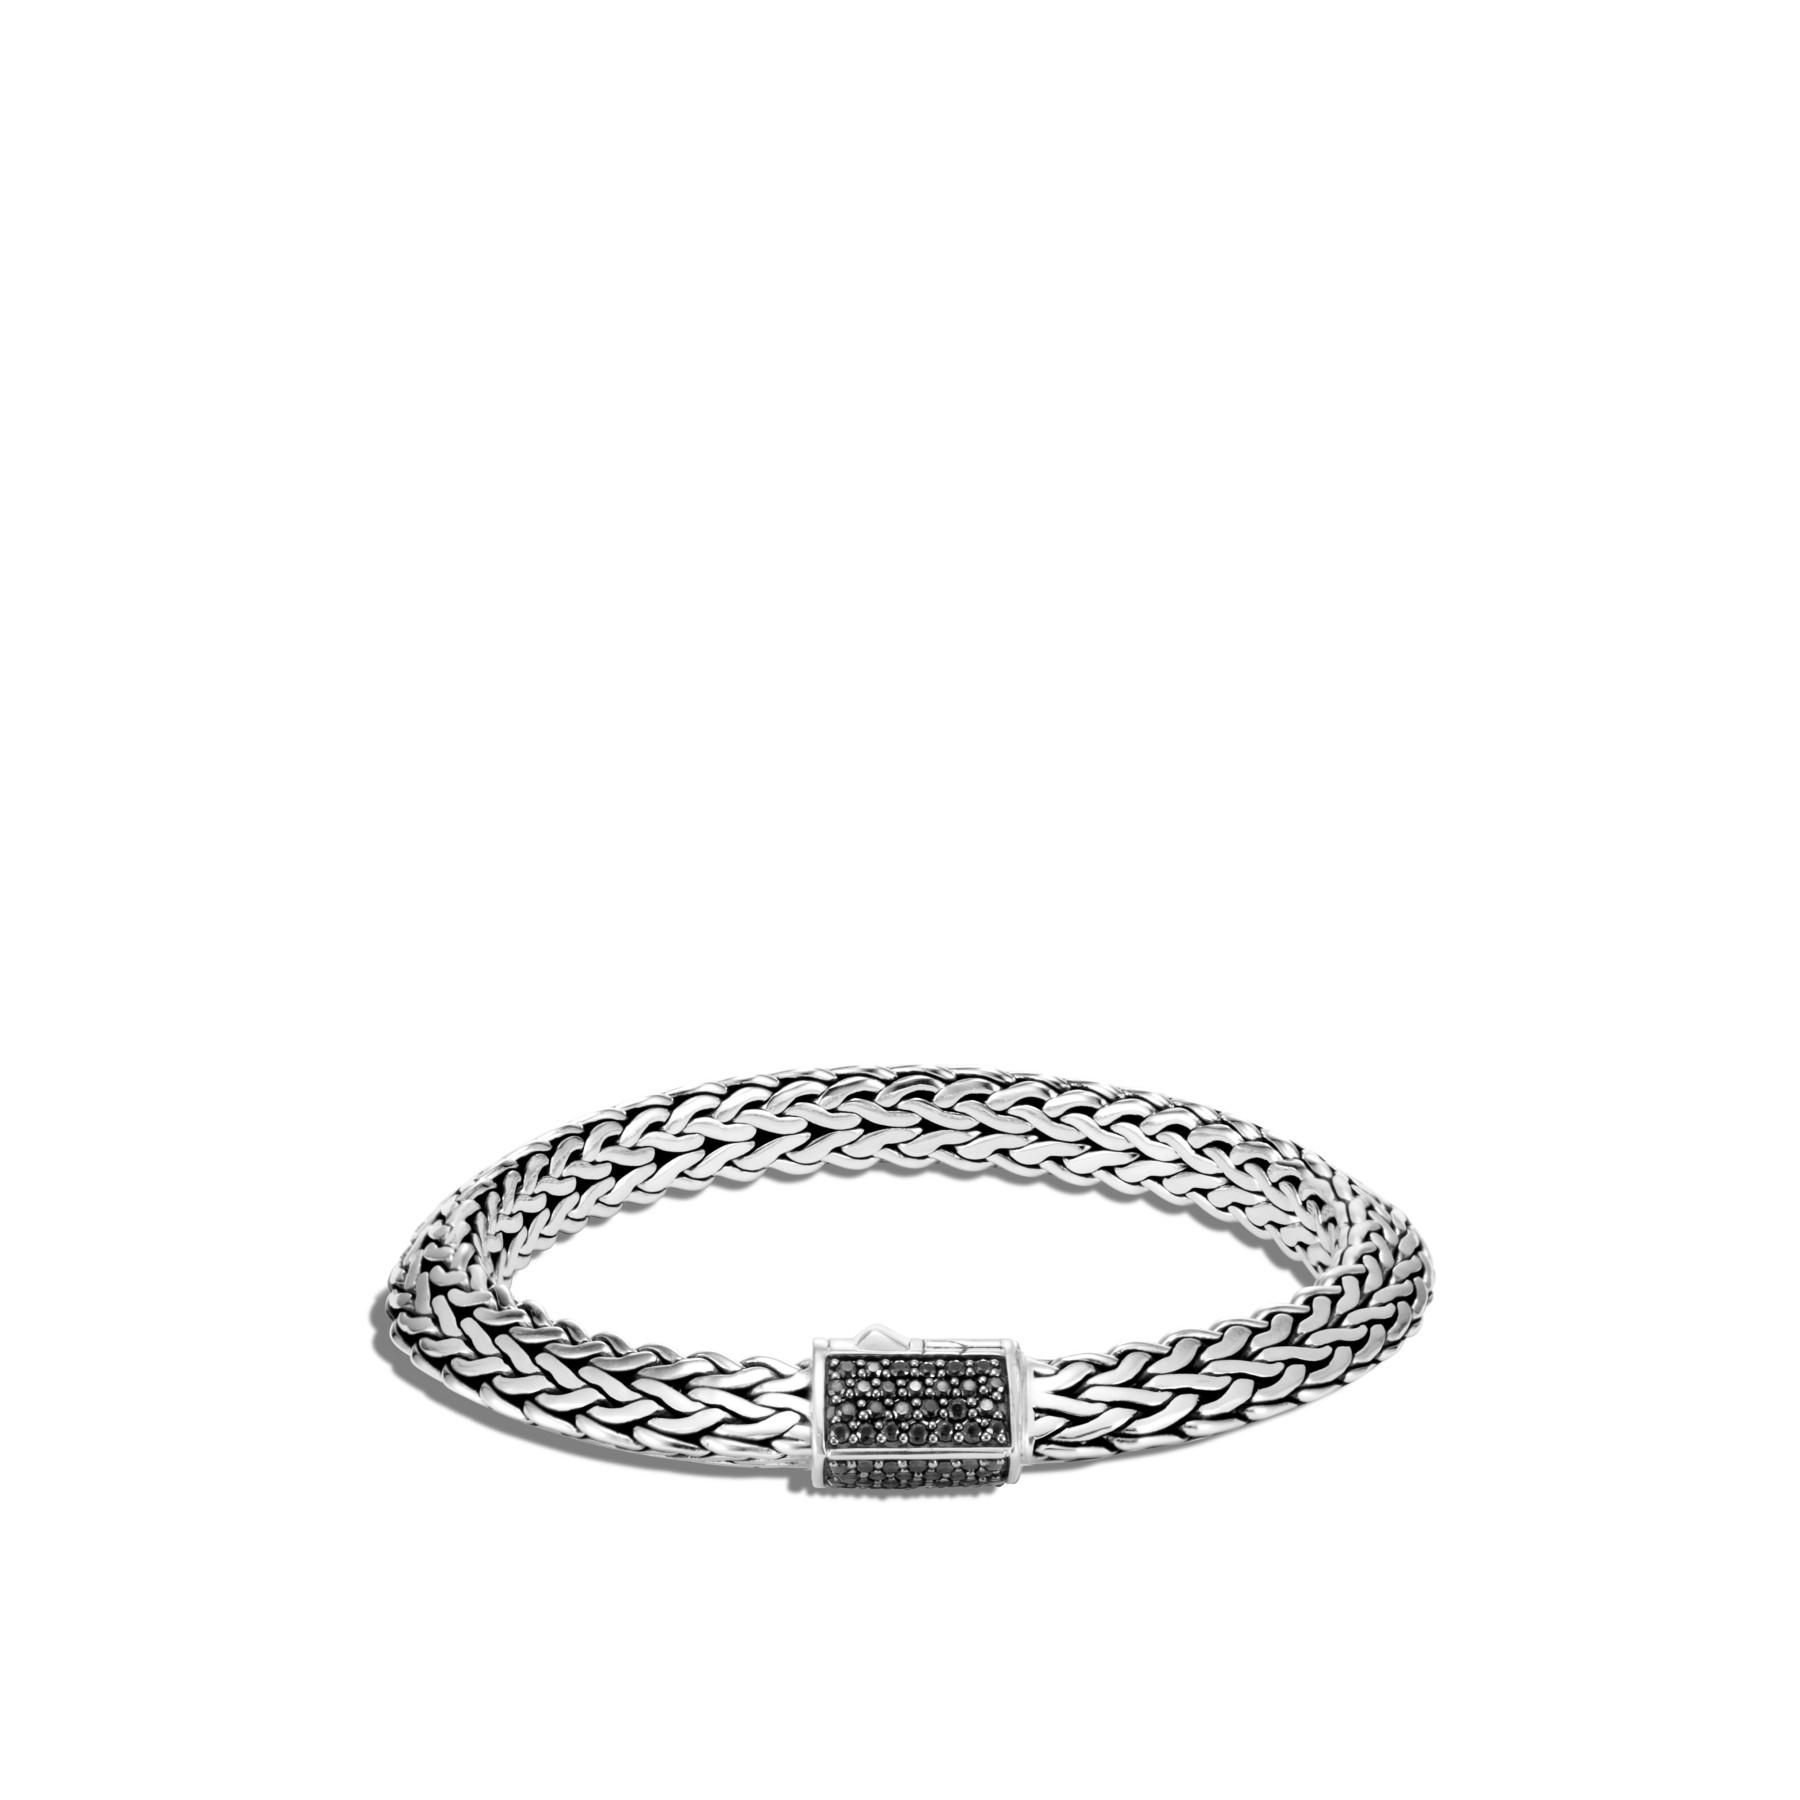 John Hardy Classic Chain Silver Black Sapphire Bracelet - 8mm front view